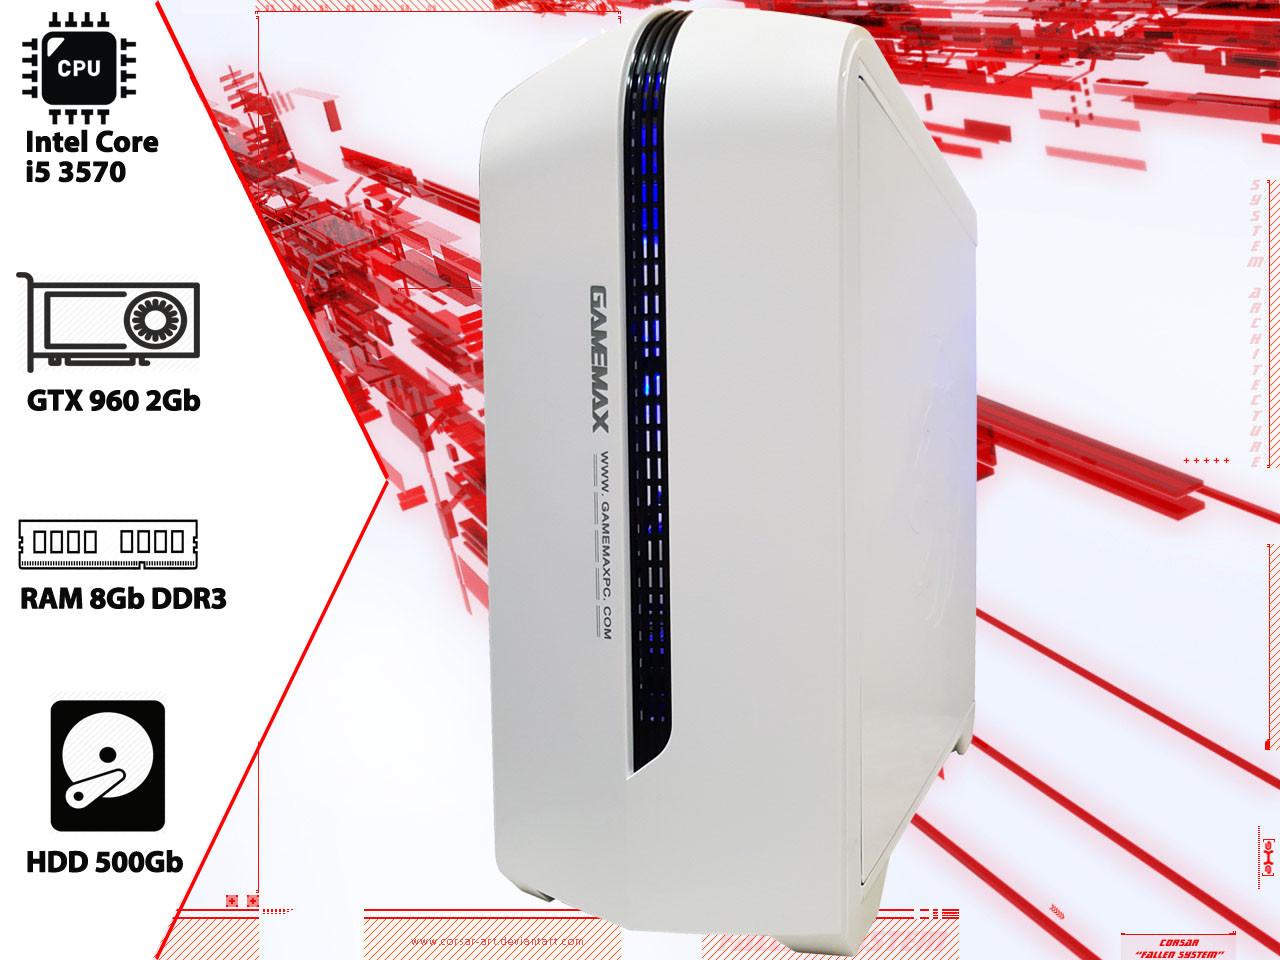 Игровой ПК Intel Core i5 3570, GTX 960, DDR3 8Gb, 500Gb